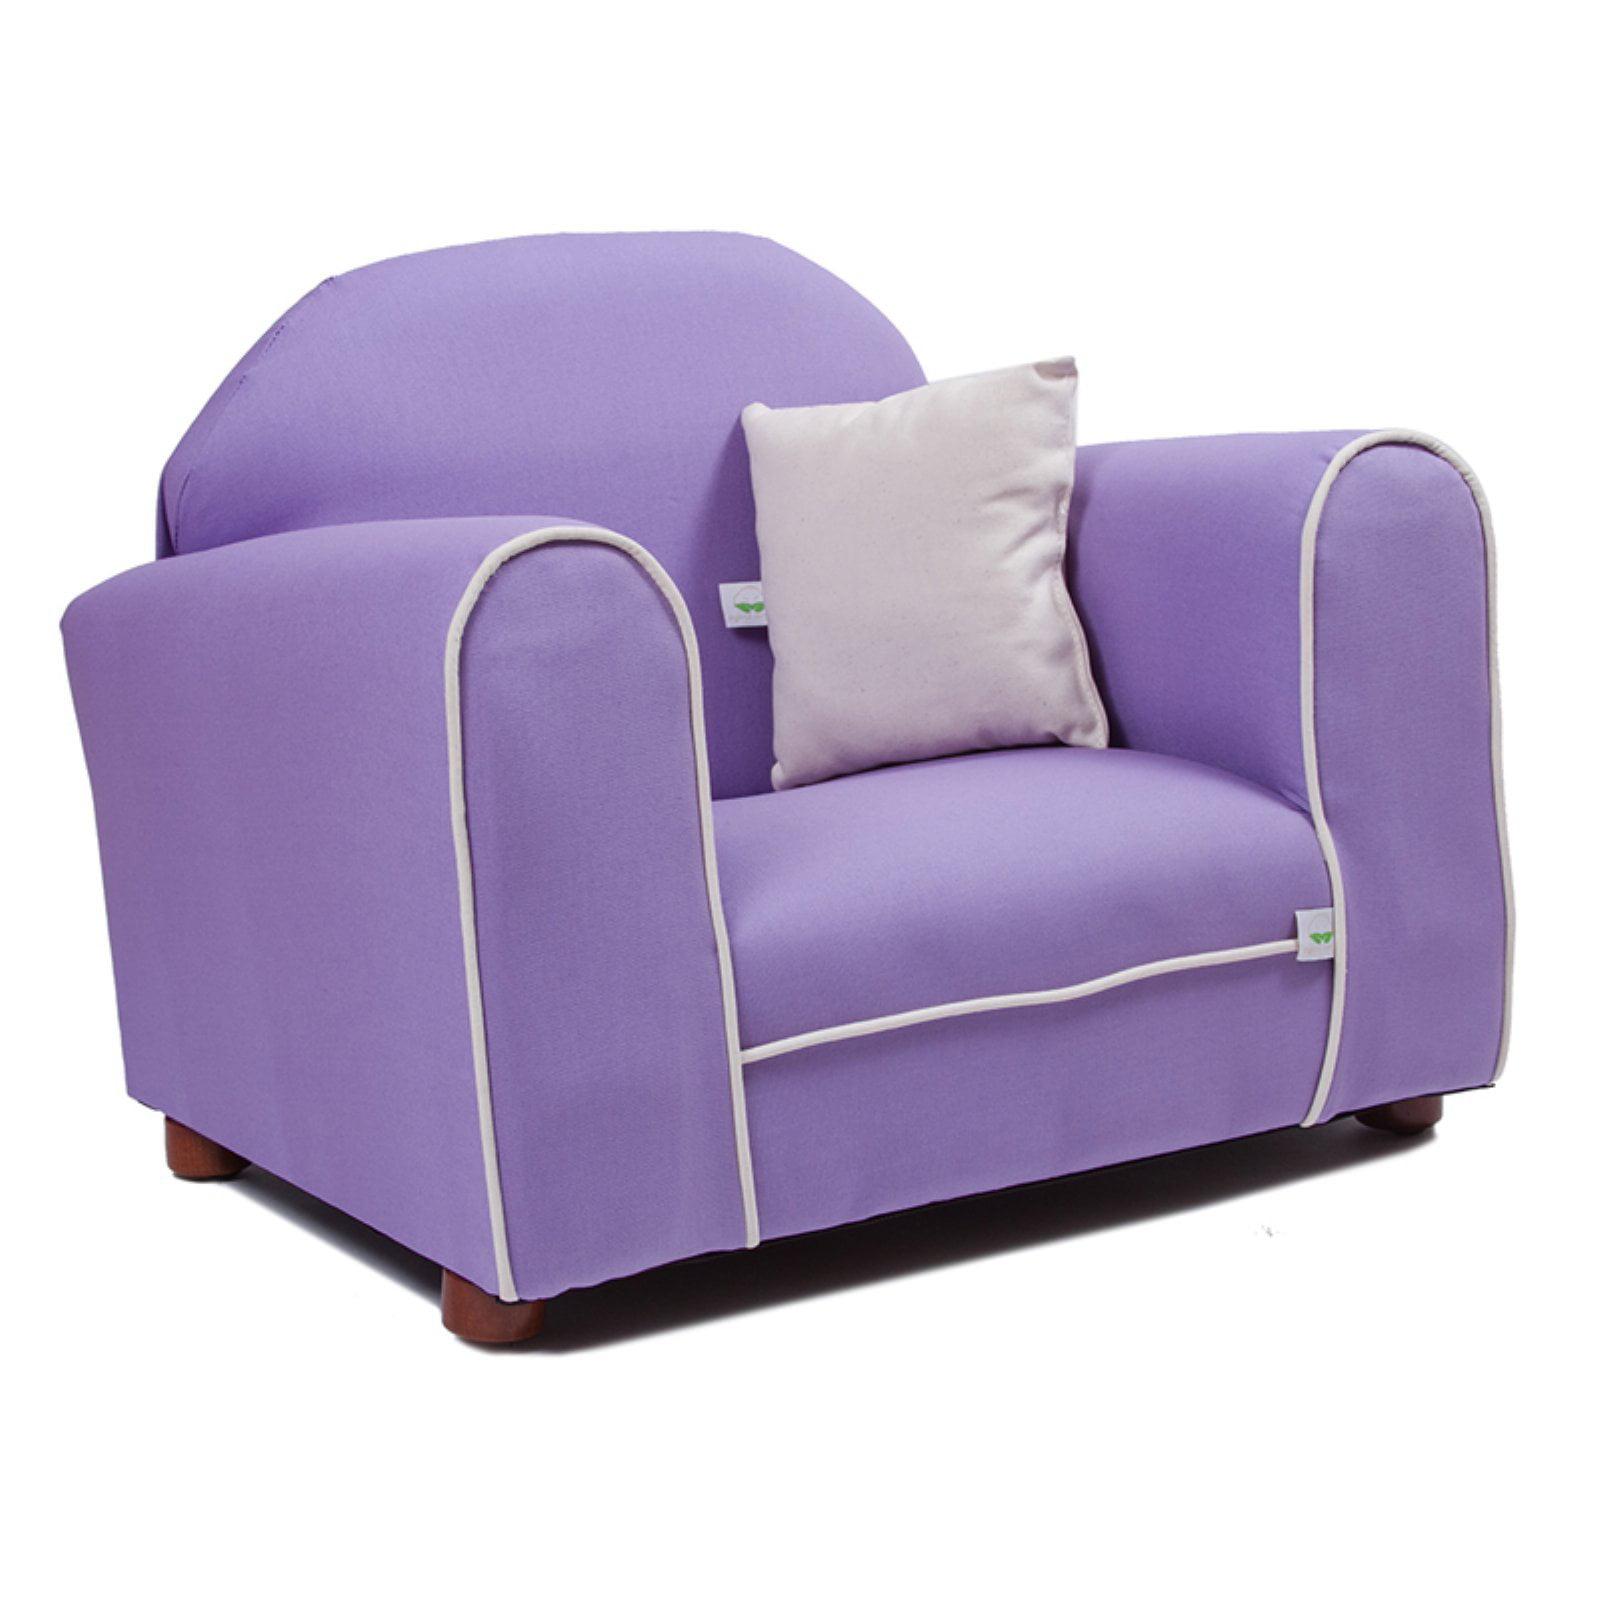 Fantasy Furniture Keep Premium Organic Kids Chair